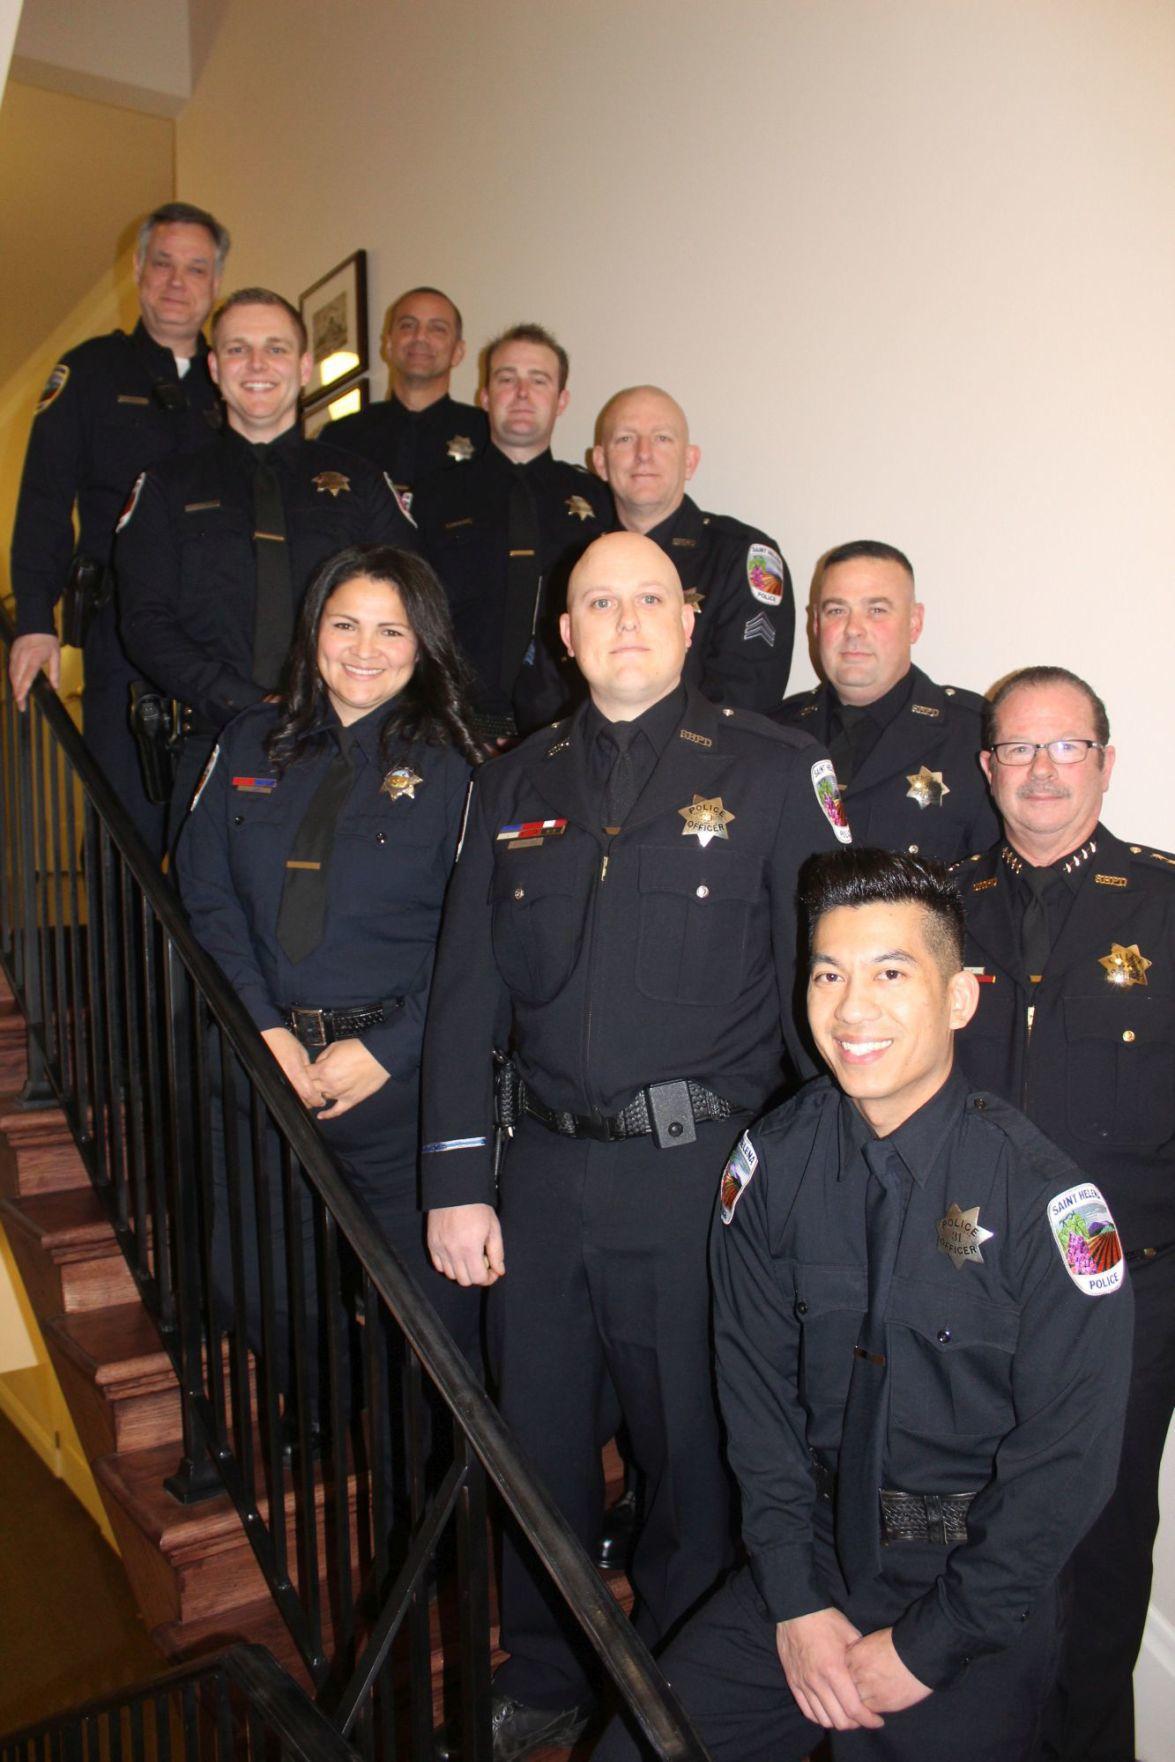 St. Helena police